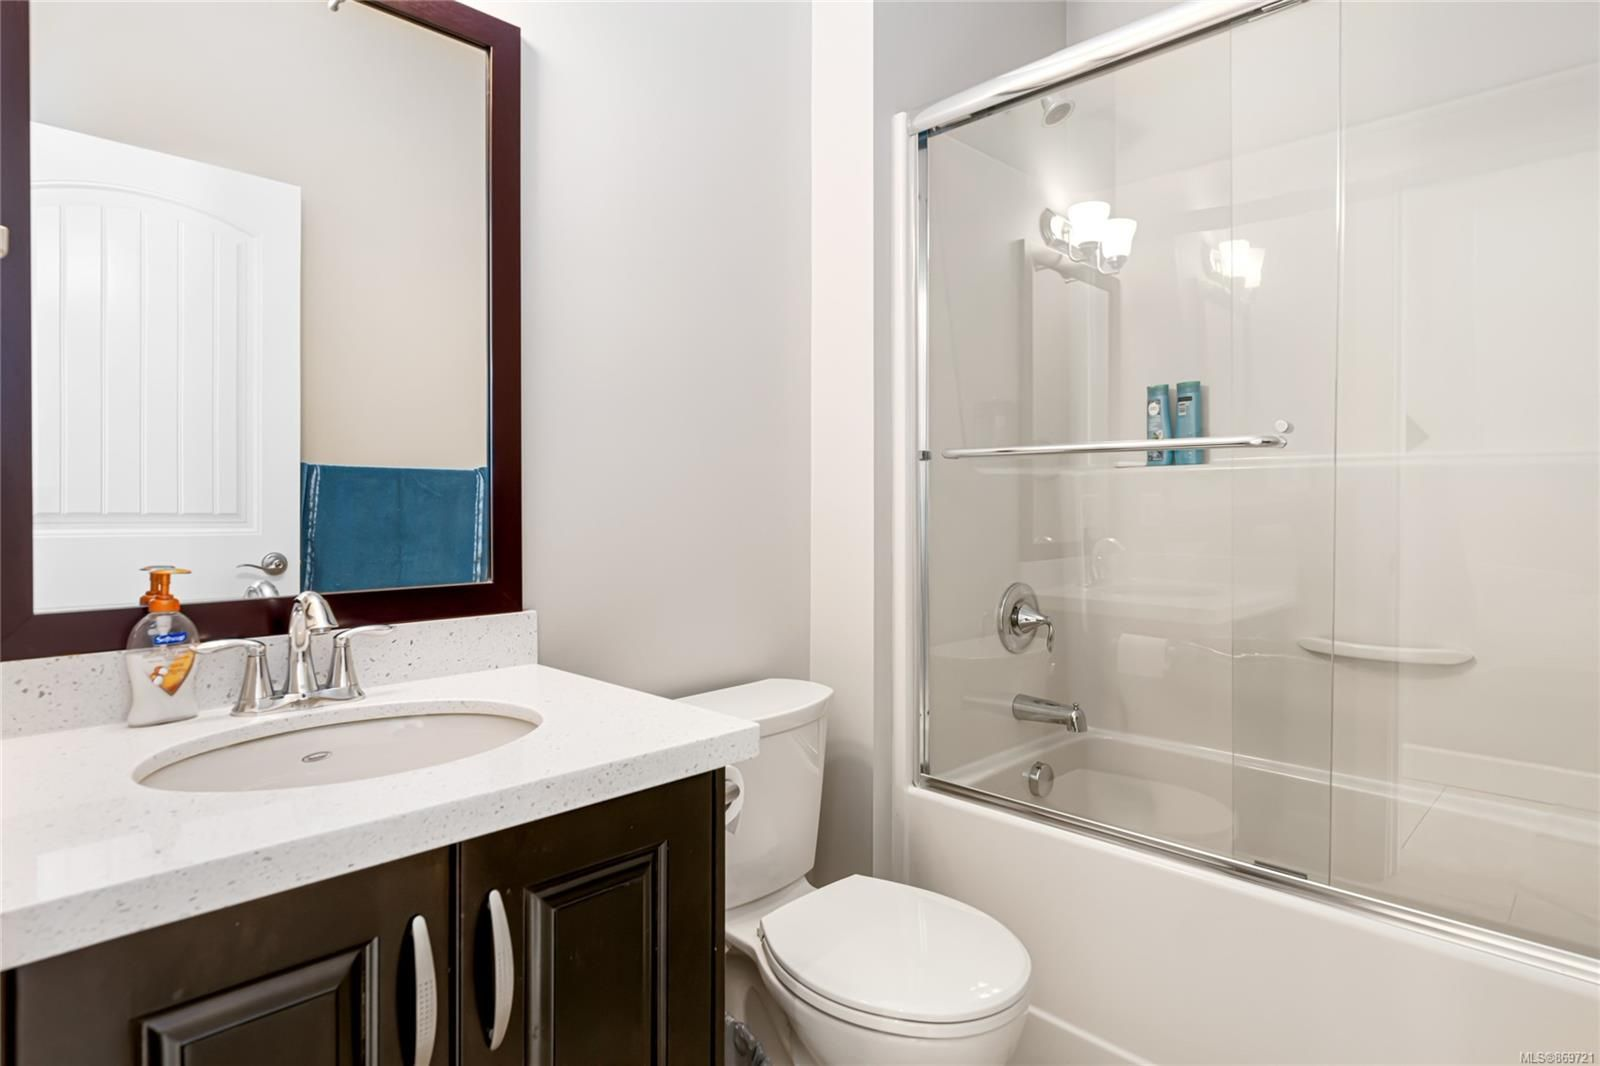 Photo 10: Photos: 2259 Leighton Rd in : Na South Jingle Pot House for sale (Nanaimo)  : MLS®# 869721